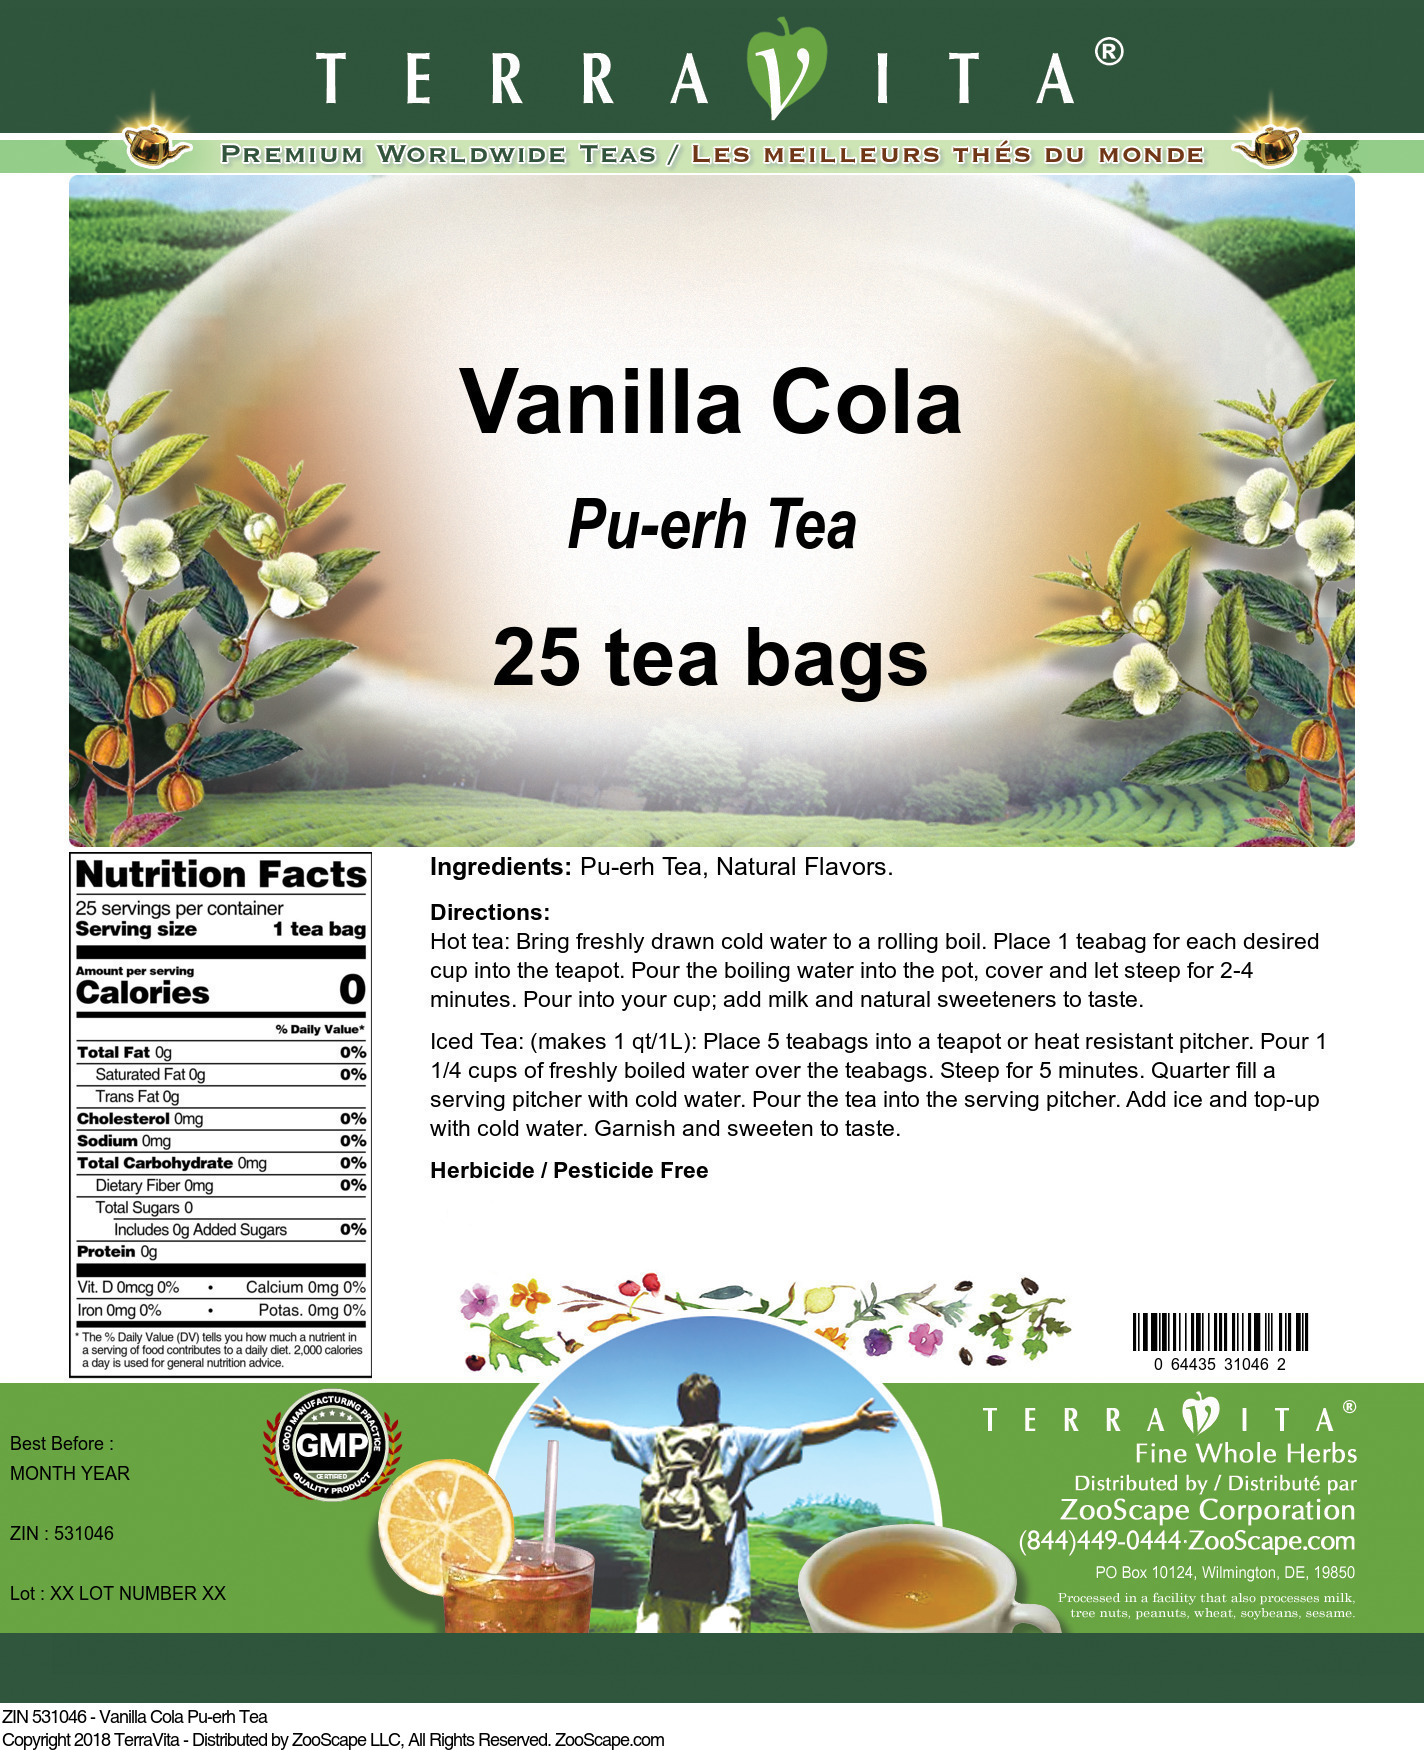 Vanilla Cola Pu-erh Tea